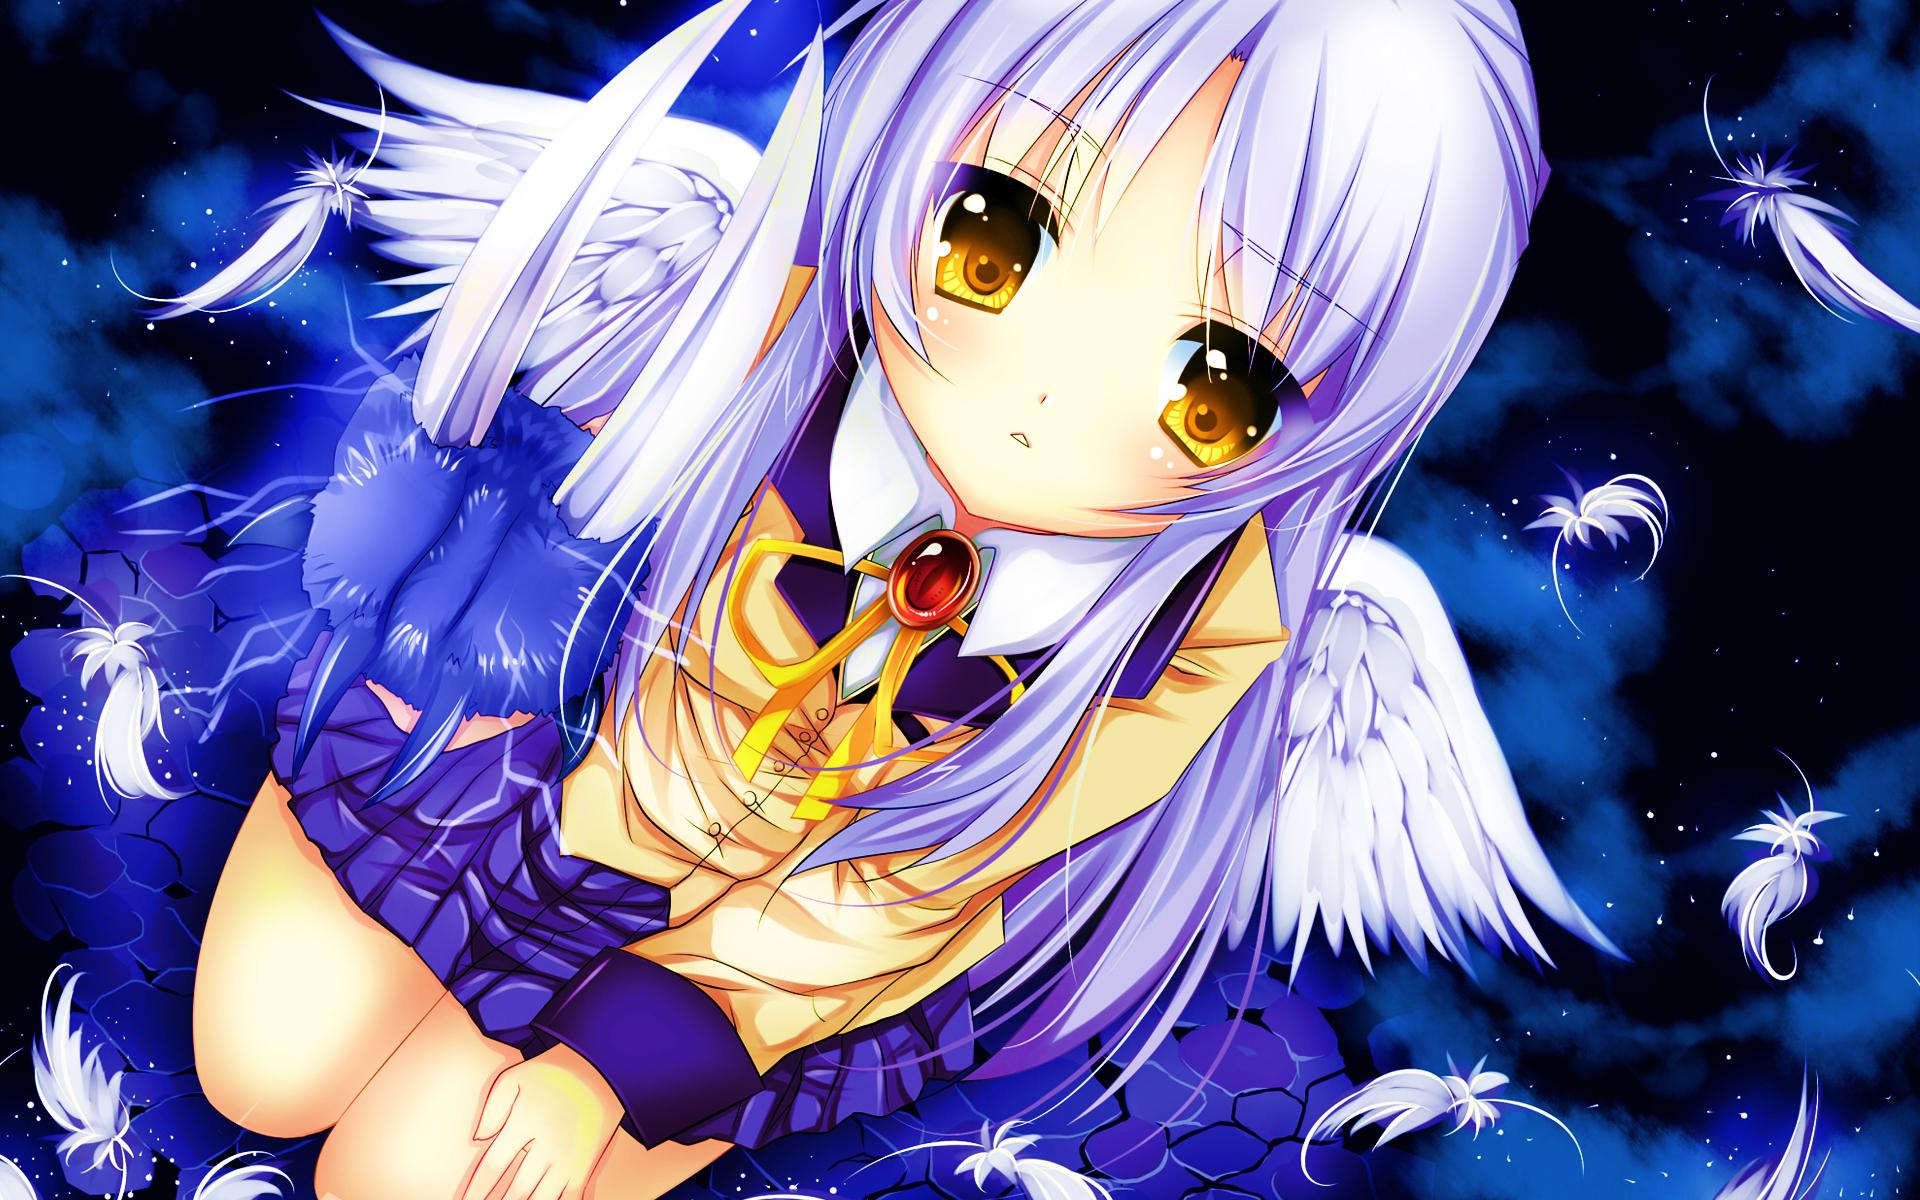 Angel Beats! HD Wallpaper   Background Image   1920x1200 ...